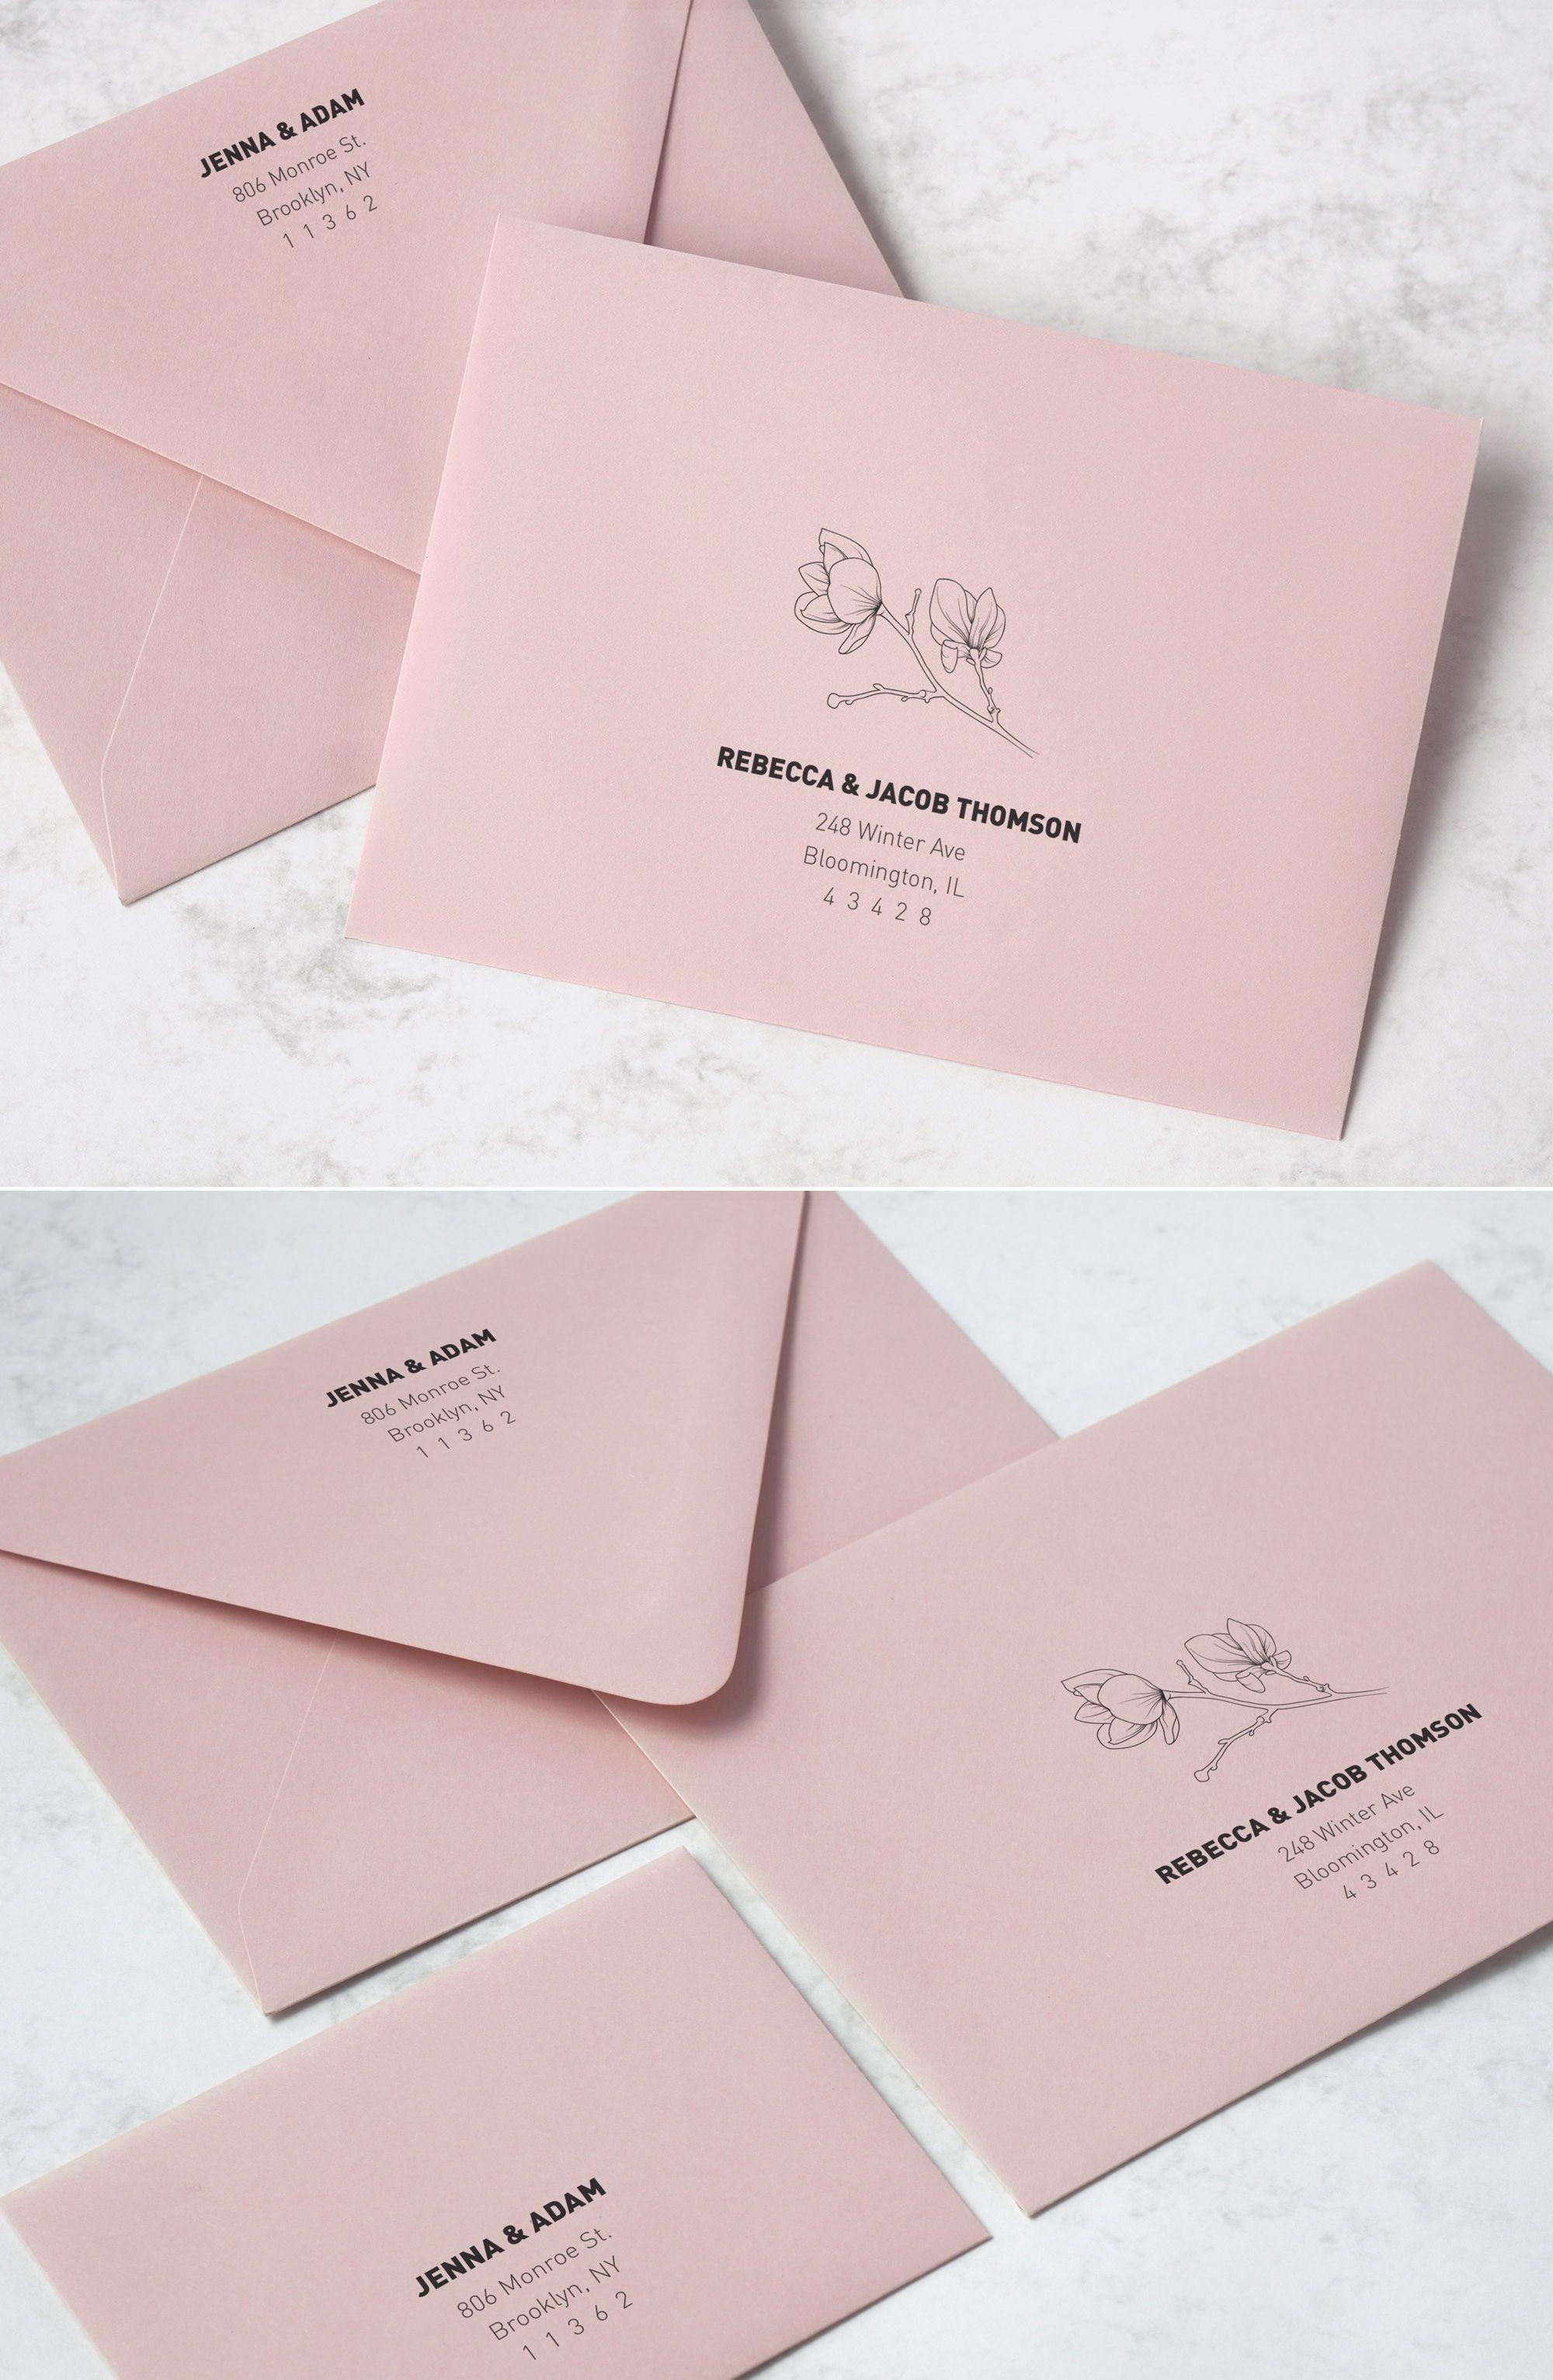 Printable Envelope Addressing Template Magnolia Wedding Etsy In 2020 Wedding Invitation Envelopes Floral Wedding Envelopes Envelope Addressing Template